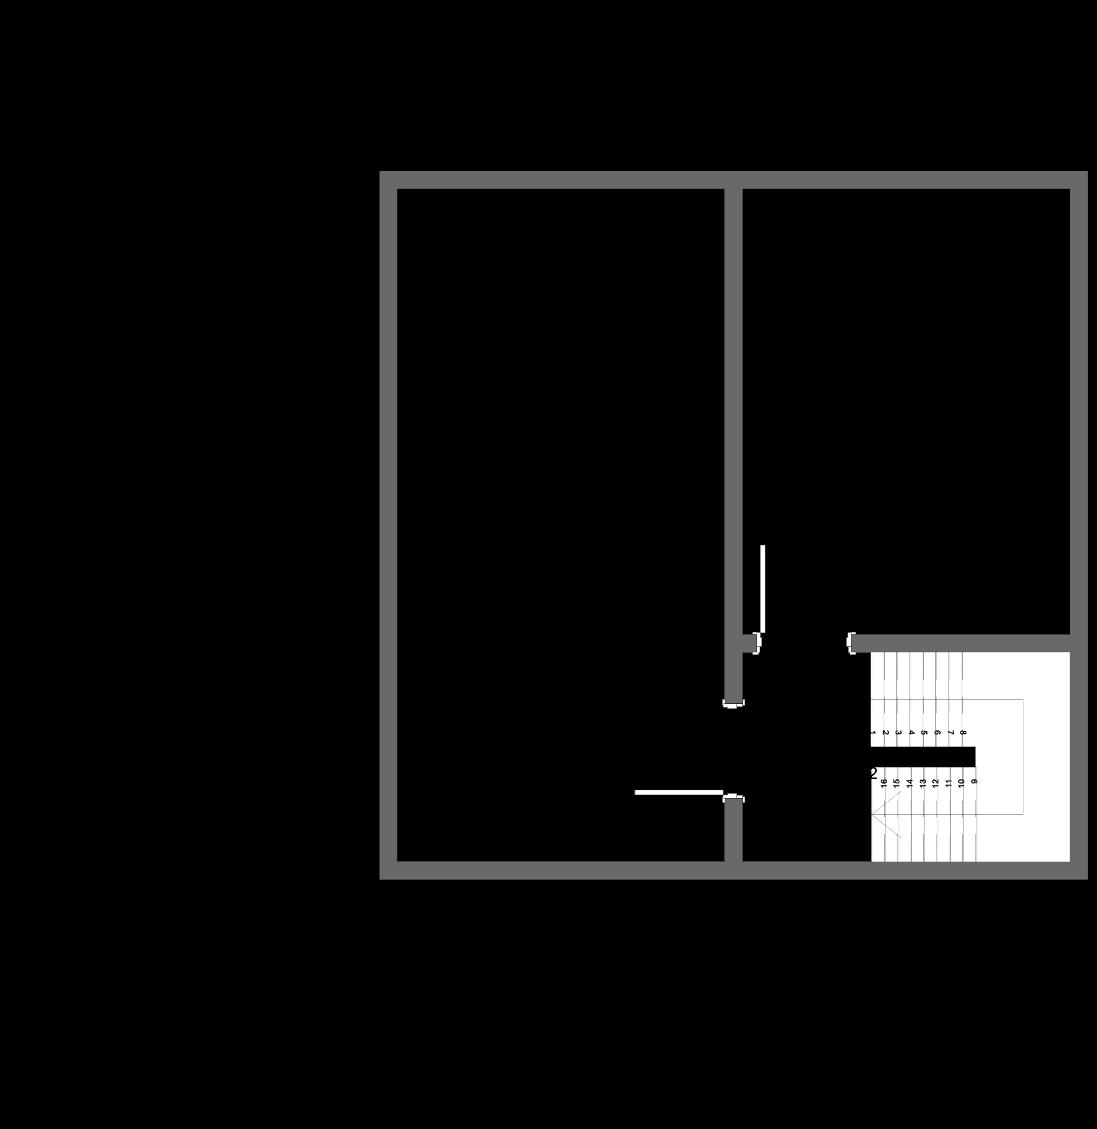 banya-iz-brusa-6x8-1.5-etazha-s-mansardoi-planirovka-etazh2